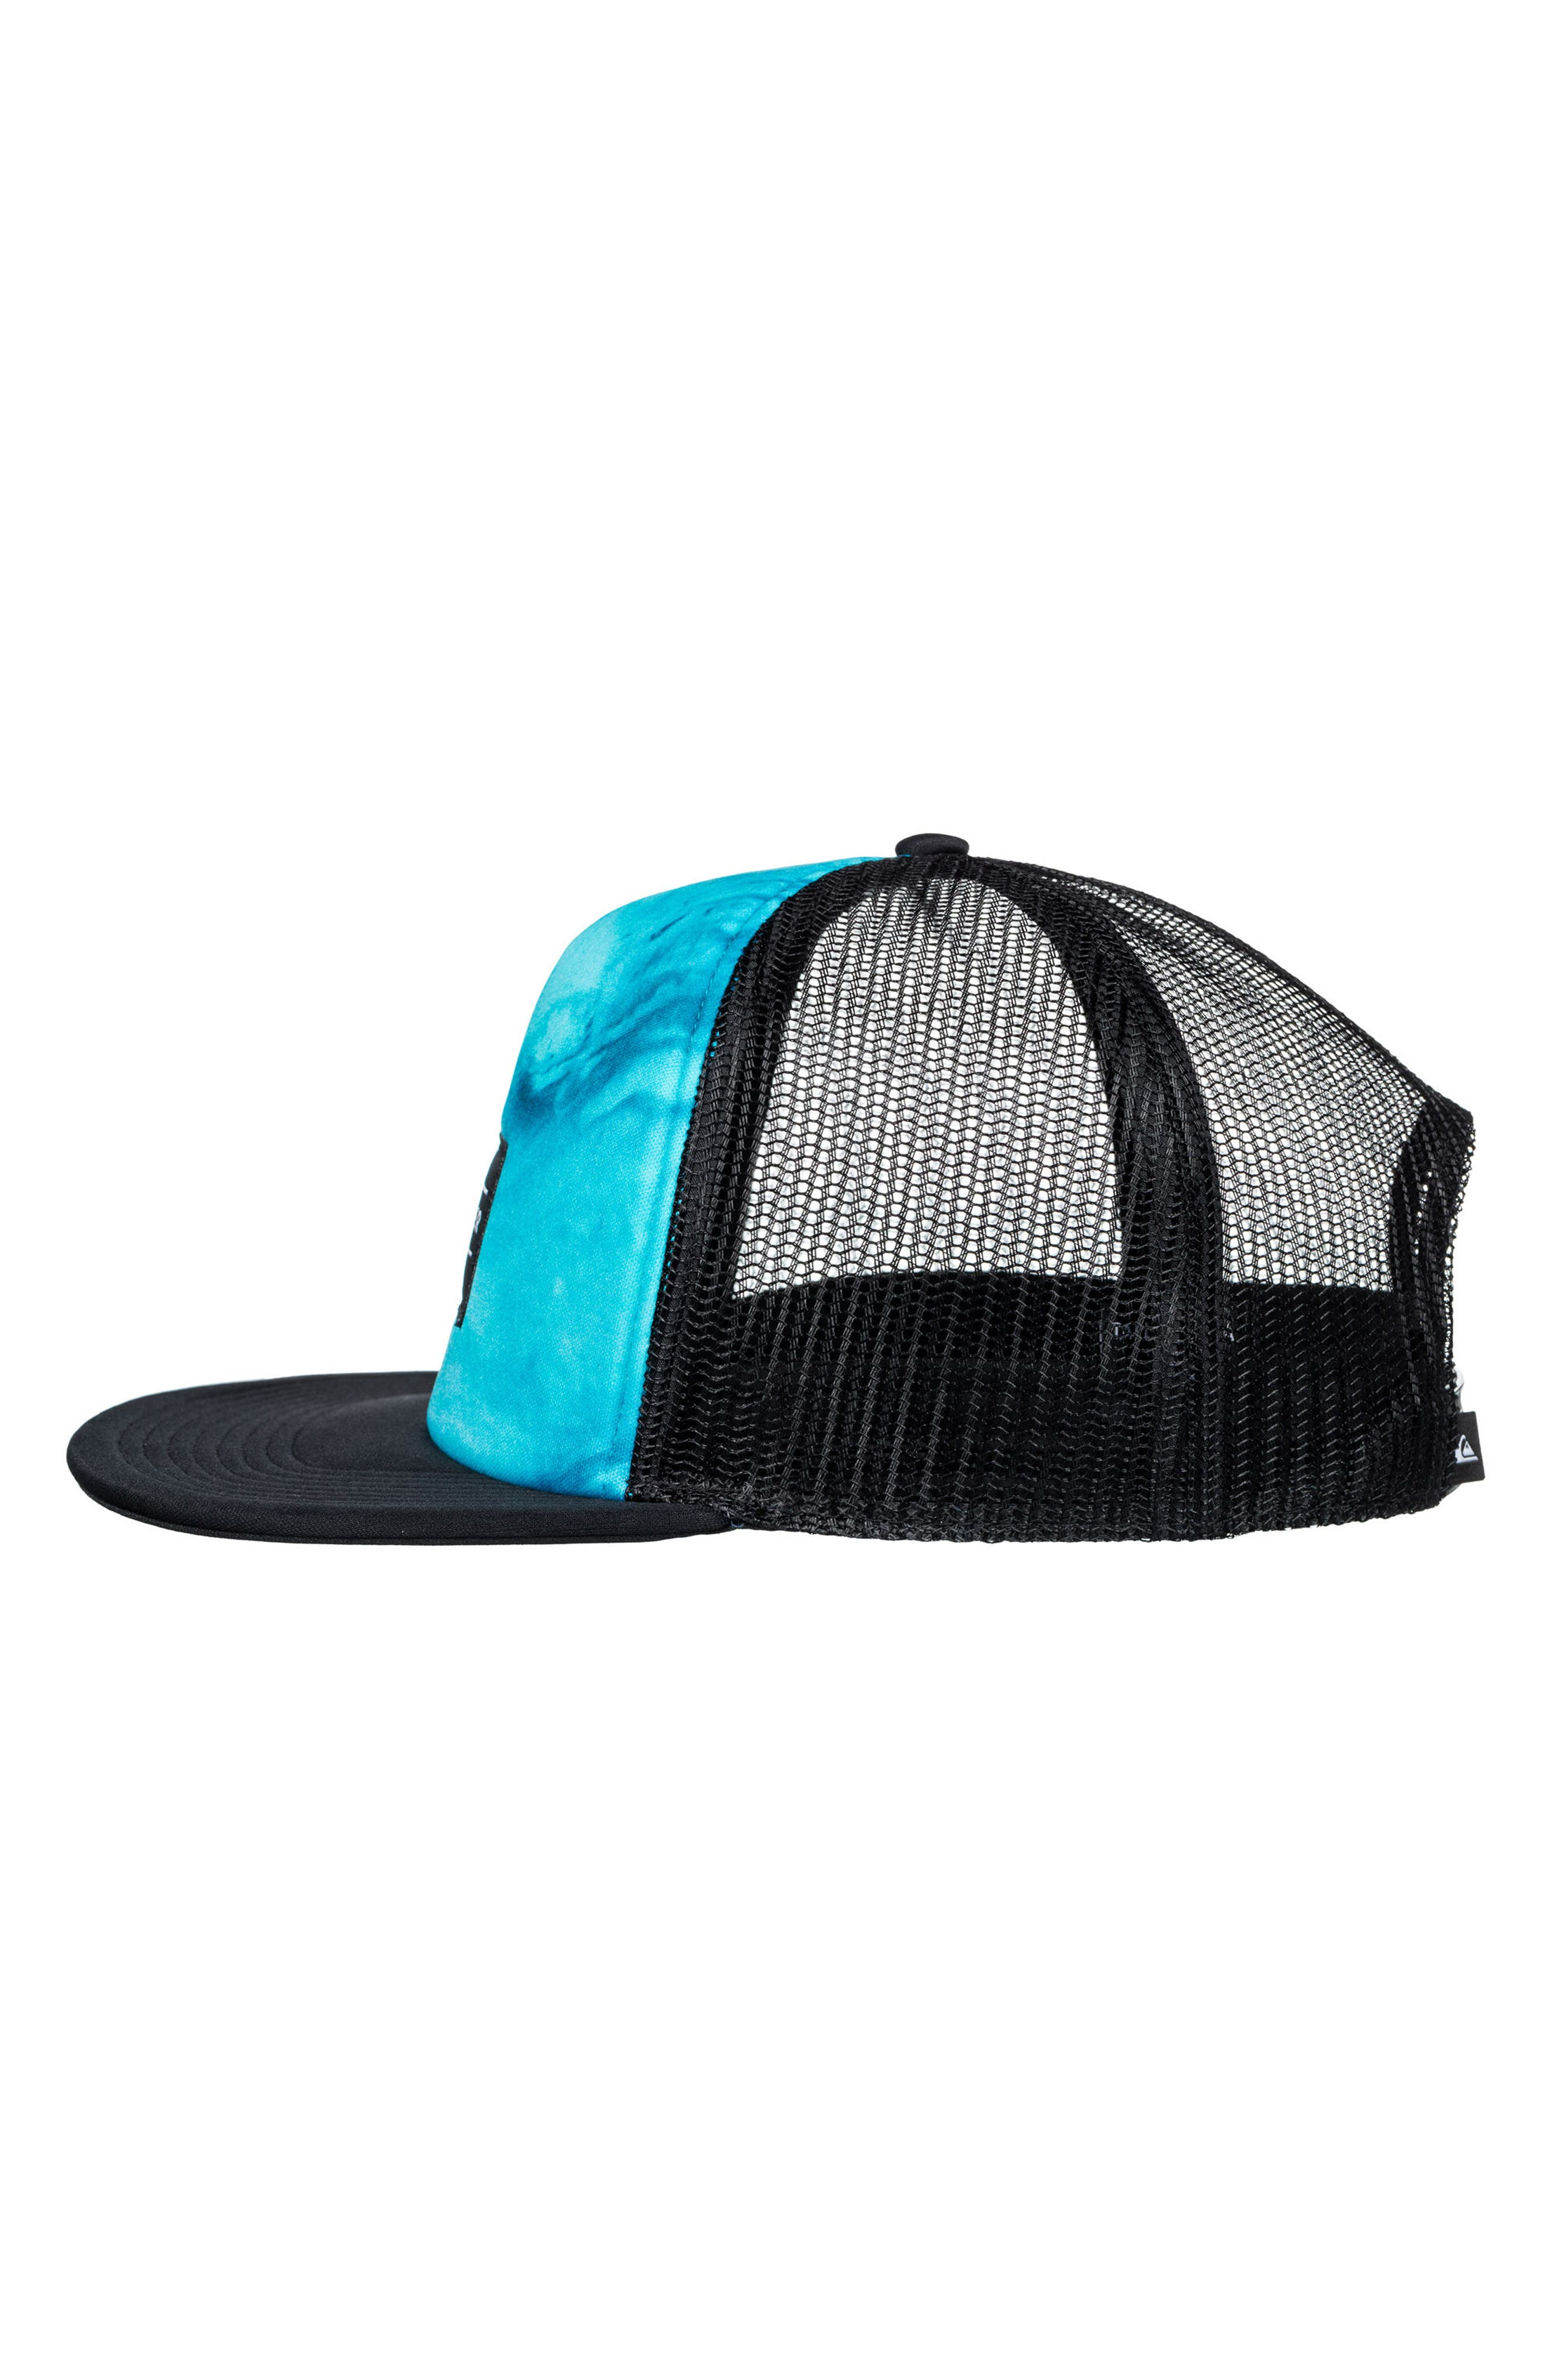 Brissells Snapback Trucker Hat,                             Alternate thumbnail 2, color,                             Black